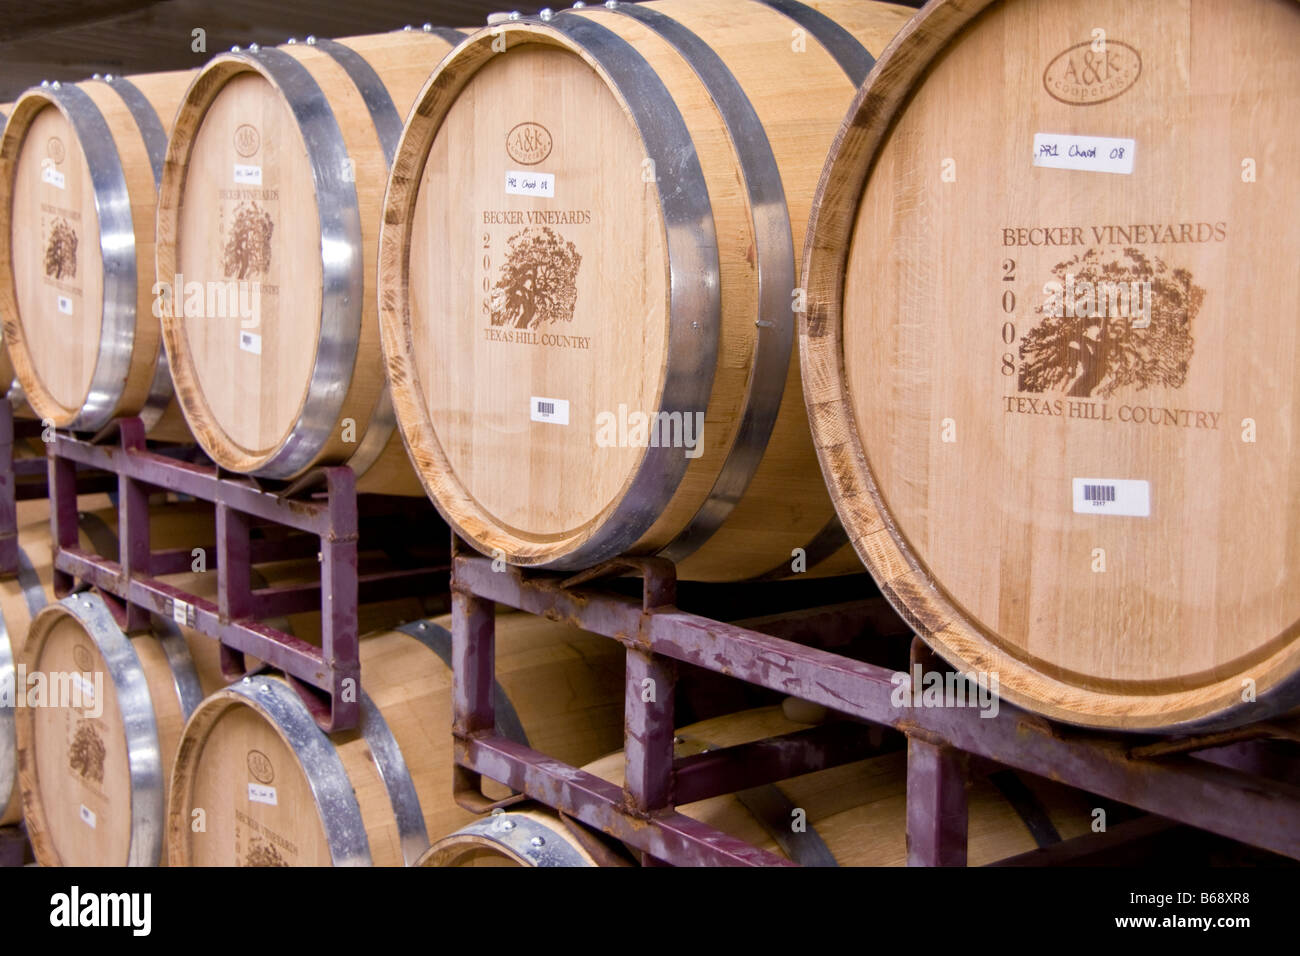 Texas Hill Country, Becker Vineyards oak aging barrels - Stock Image